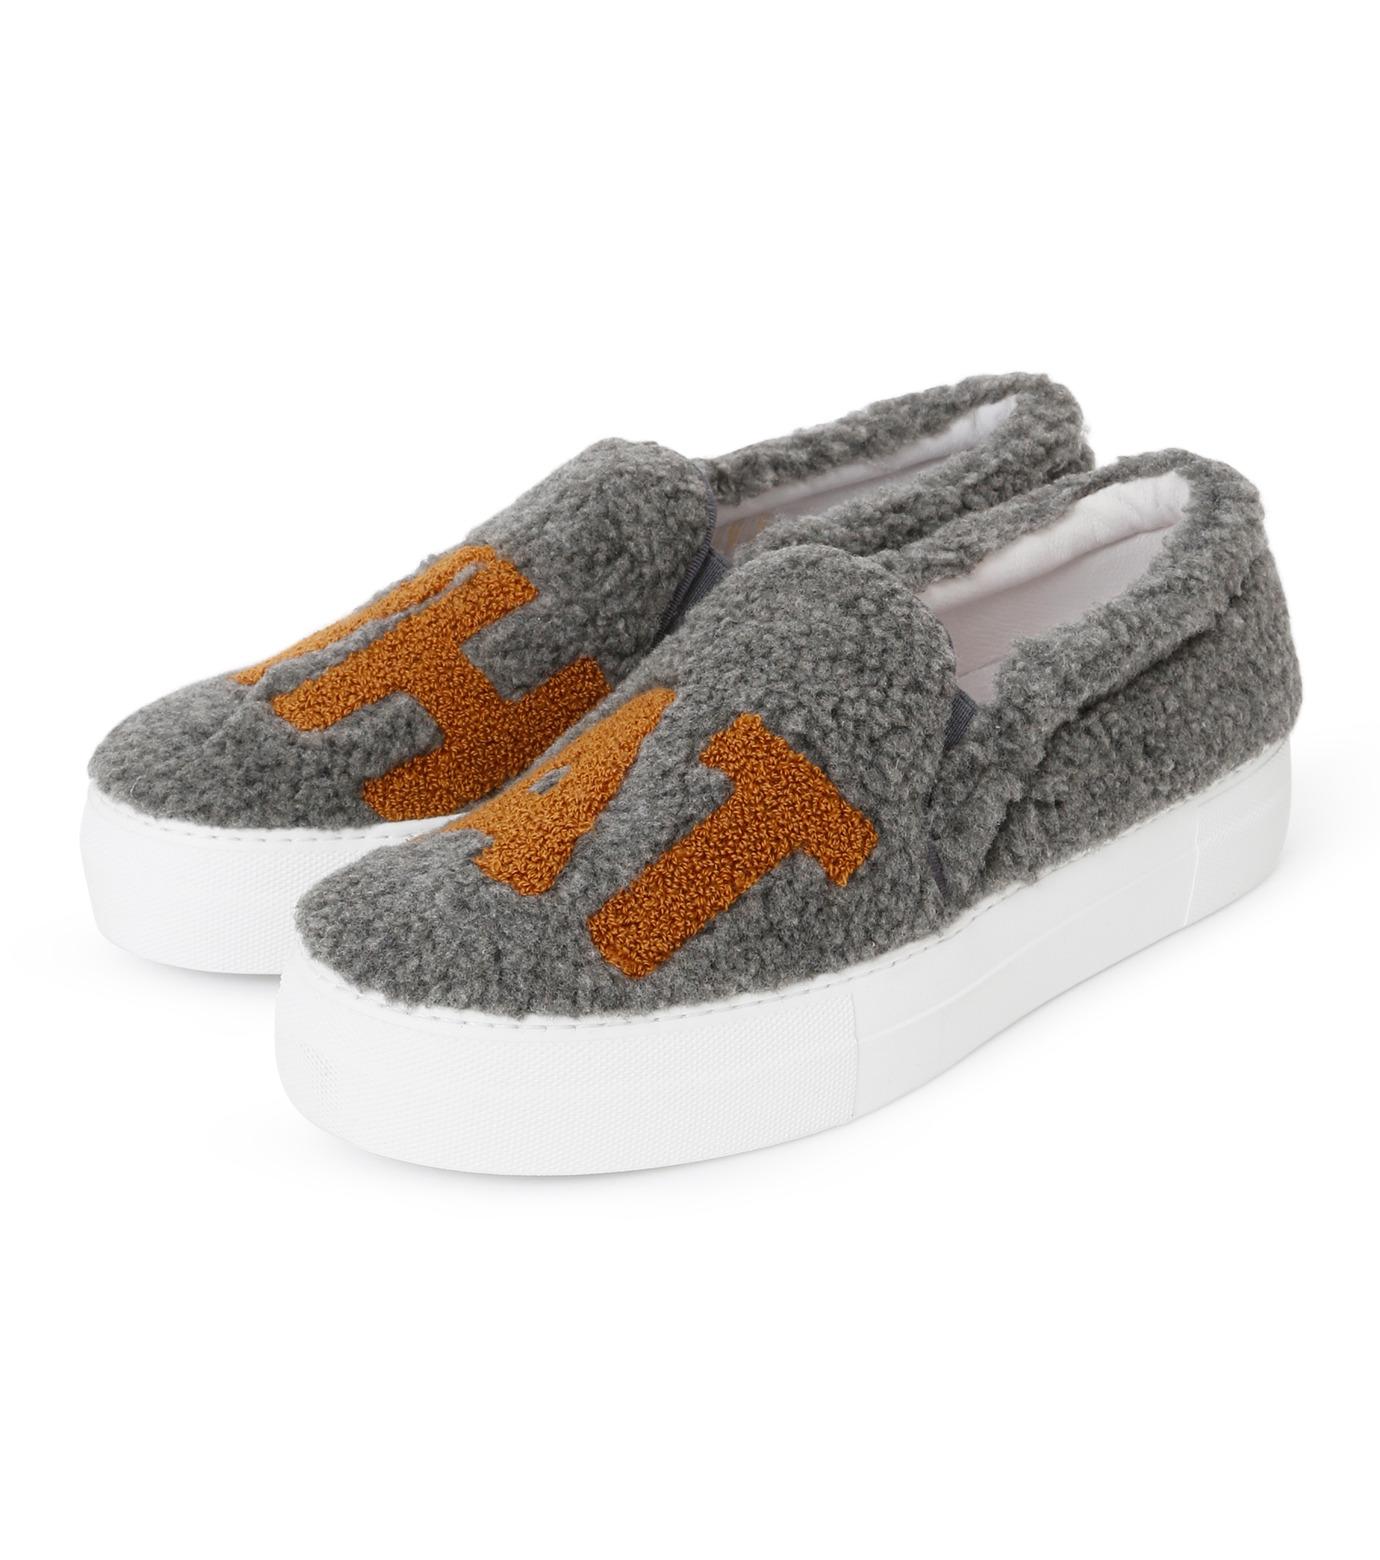 Joshua SANDERS(ジョシュア・サンダース)のSlip On Grey What-GRAY(スニーカー/sneaker)-10078S-11 拡大詳細画像2